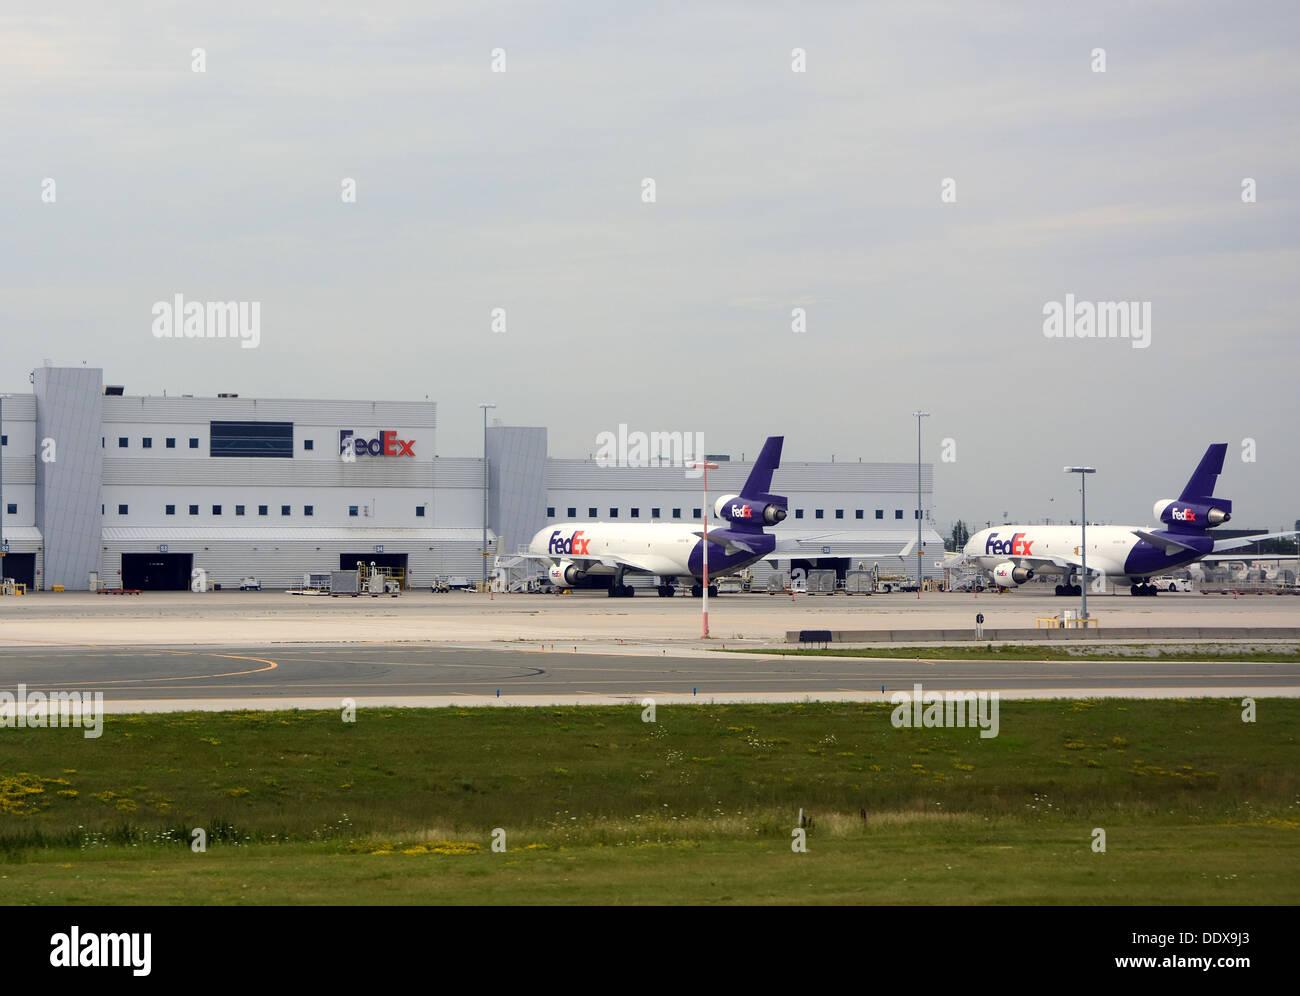 Fedex airplanes - Stock Image